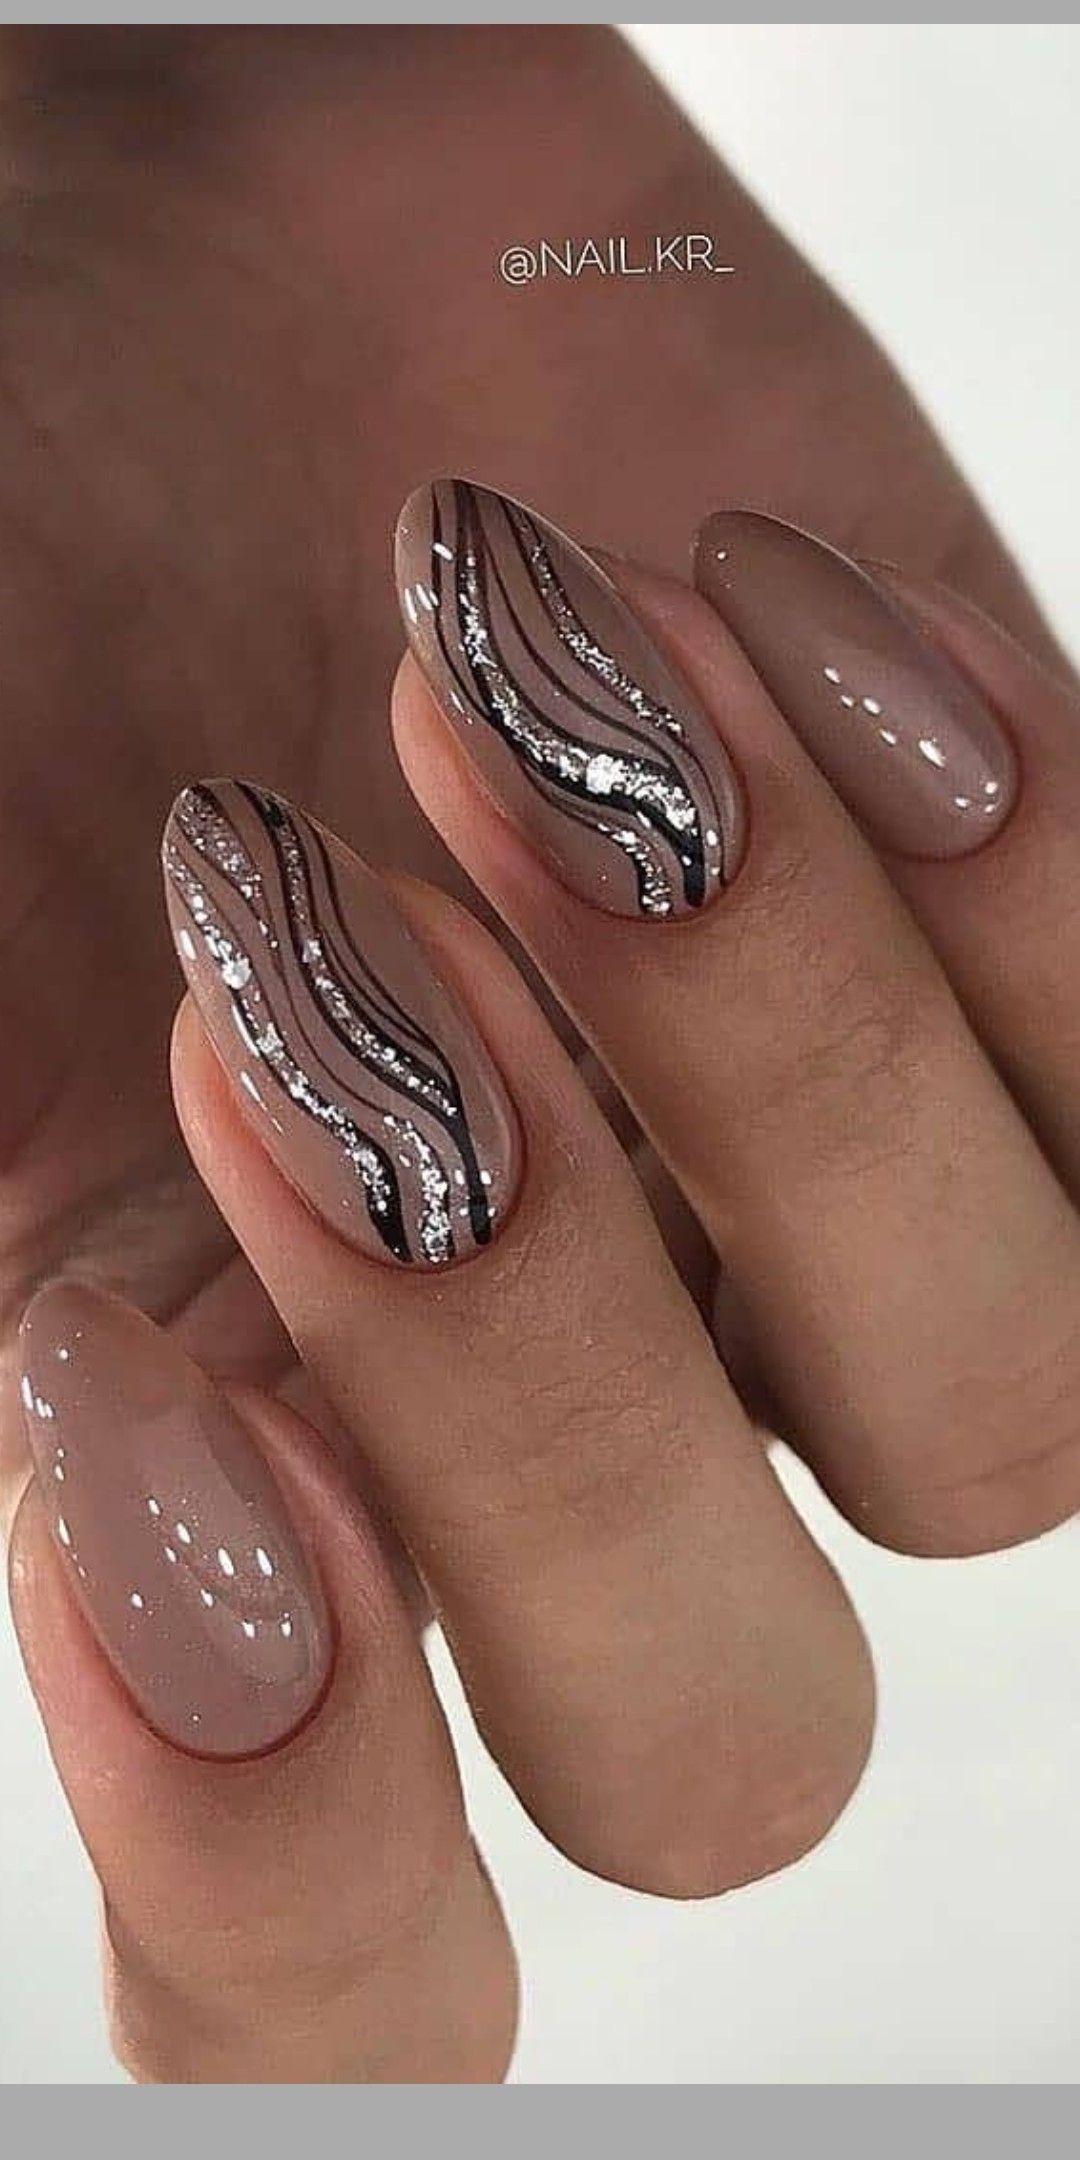 Pin By Sheila Hammond On Manikyur In 2020 Pretty Acrylic Nails Pretty Nail Art Designs Nail Designs